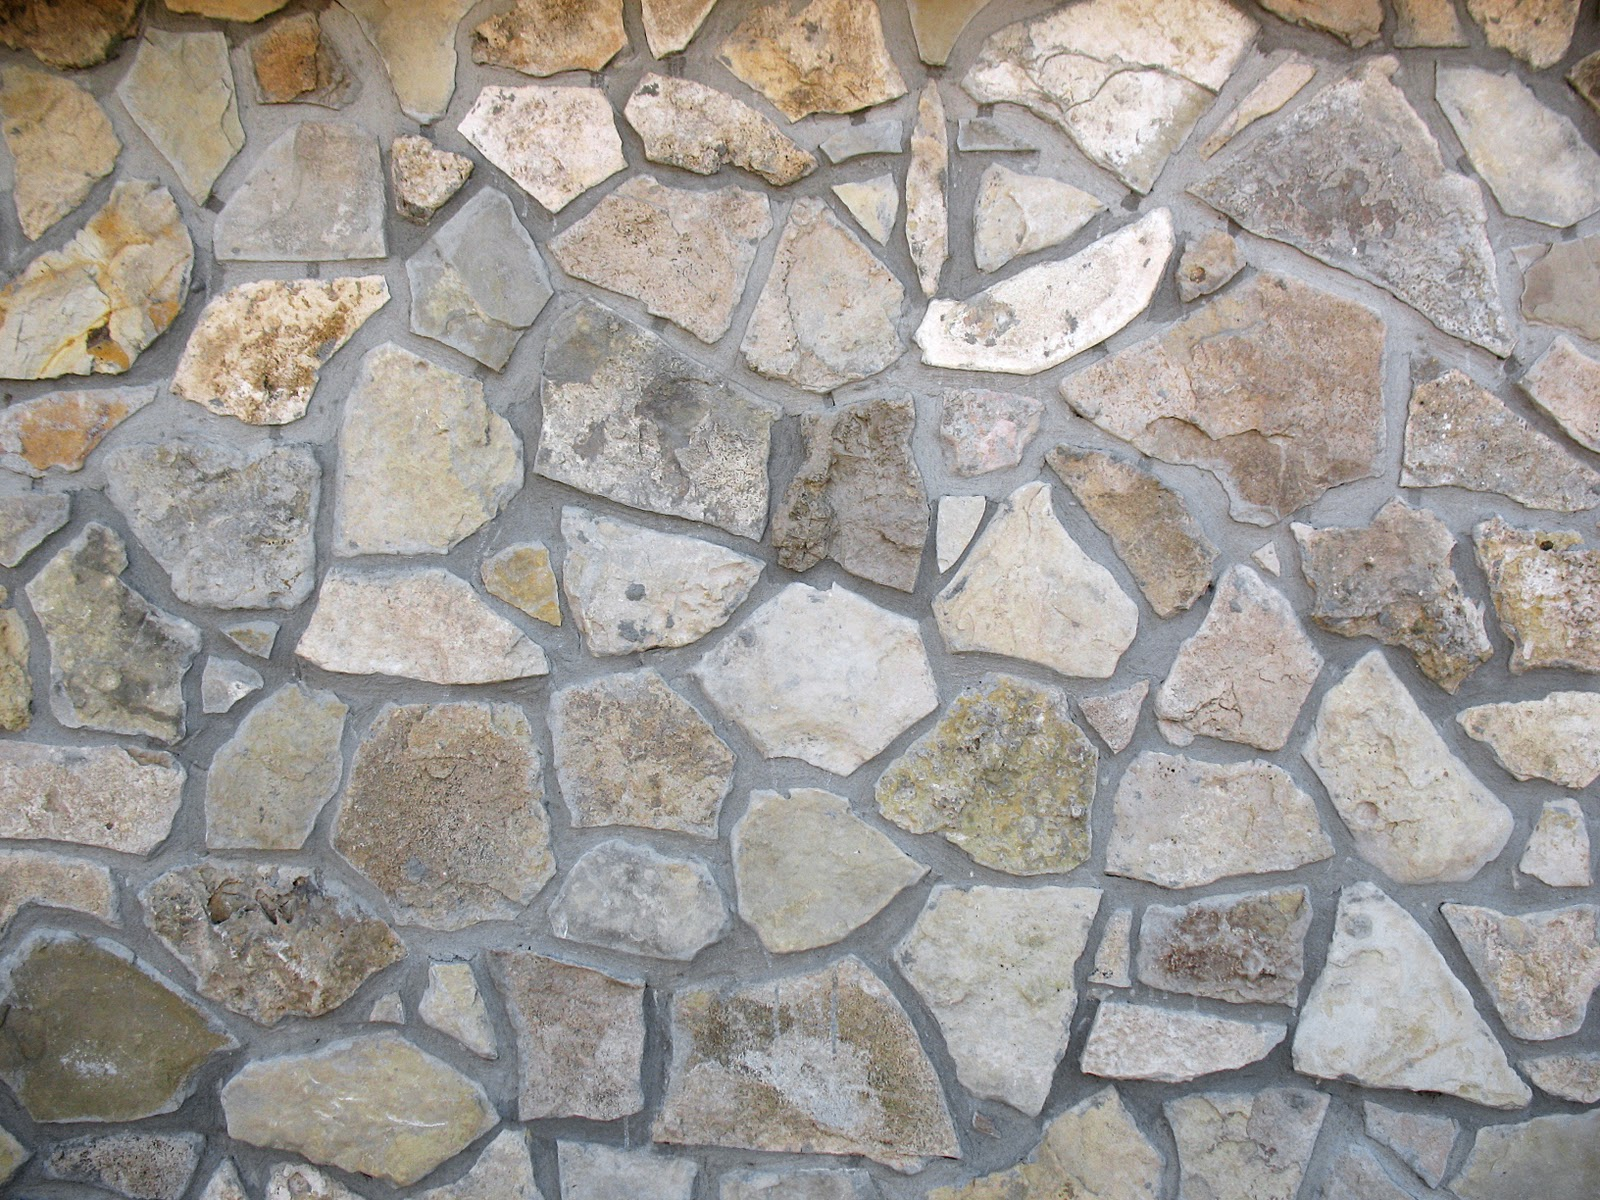 http://4.bp.blogspot.com/_5YQzFd7SgnI/TTiAEihjtxI/AAAAAAAAAxE/ccH56IOrTUo/s1600/Stone+wall+texture+2.jpg